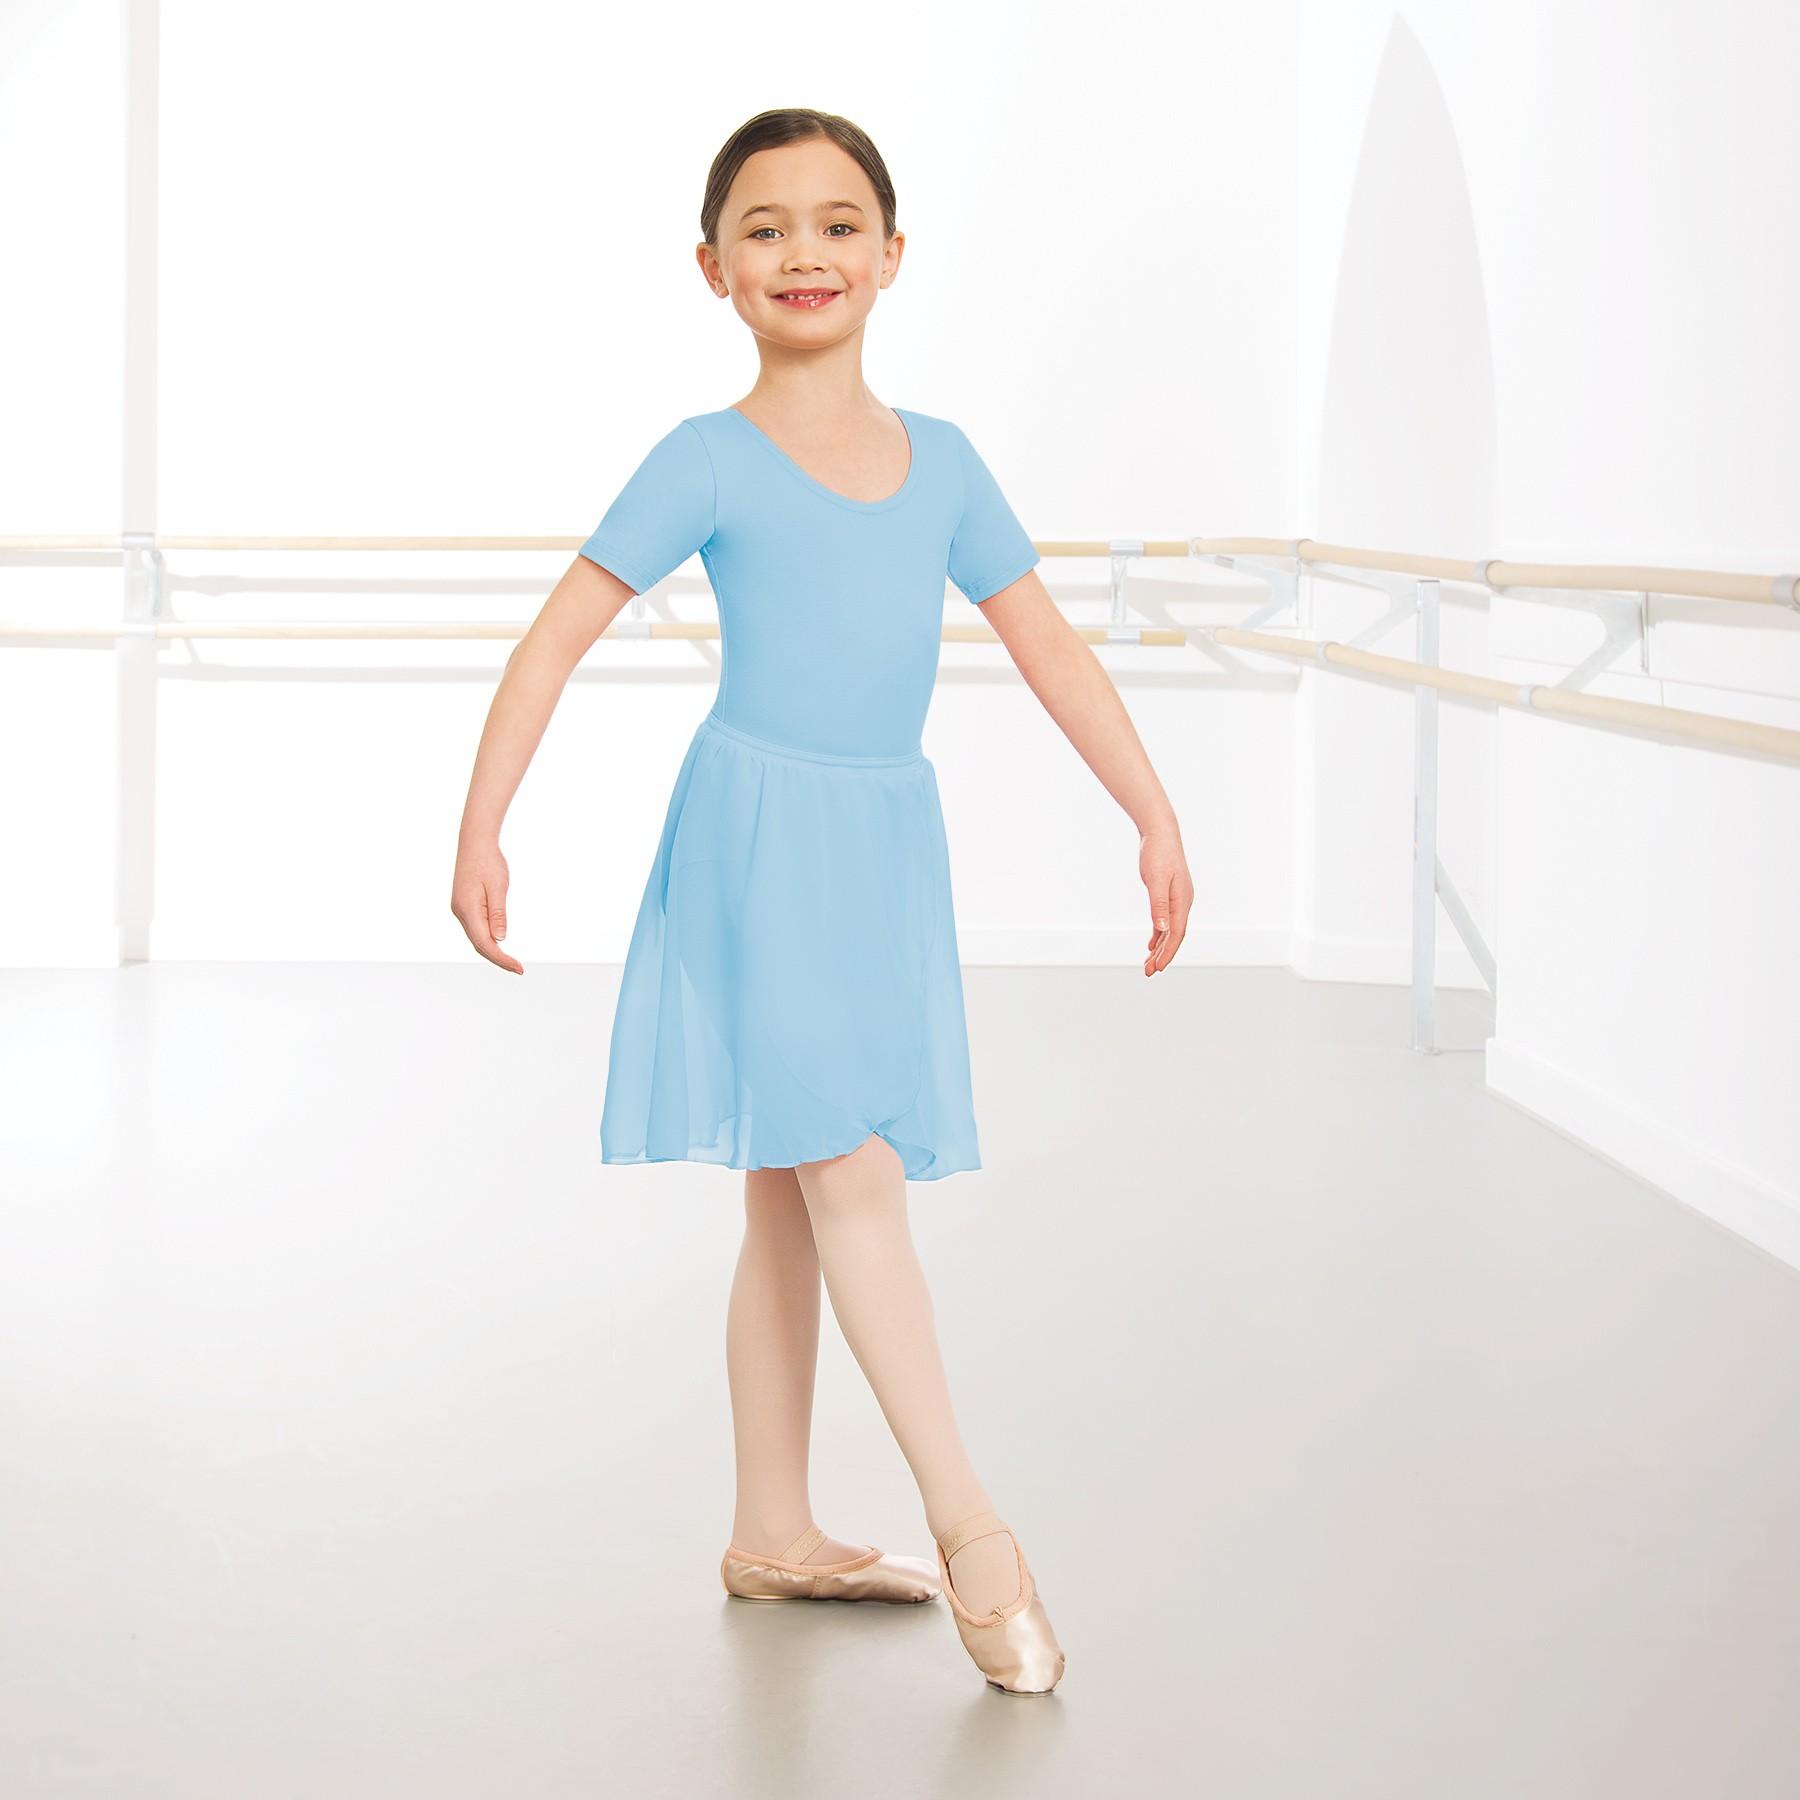 1st Position Wrapover Chiffon Skirt (Pale Blue)